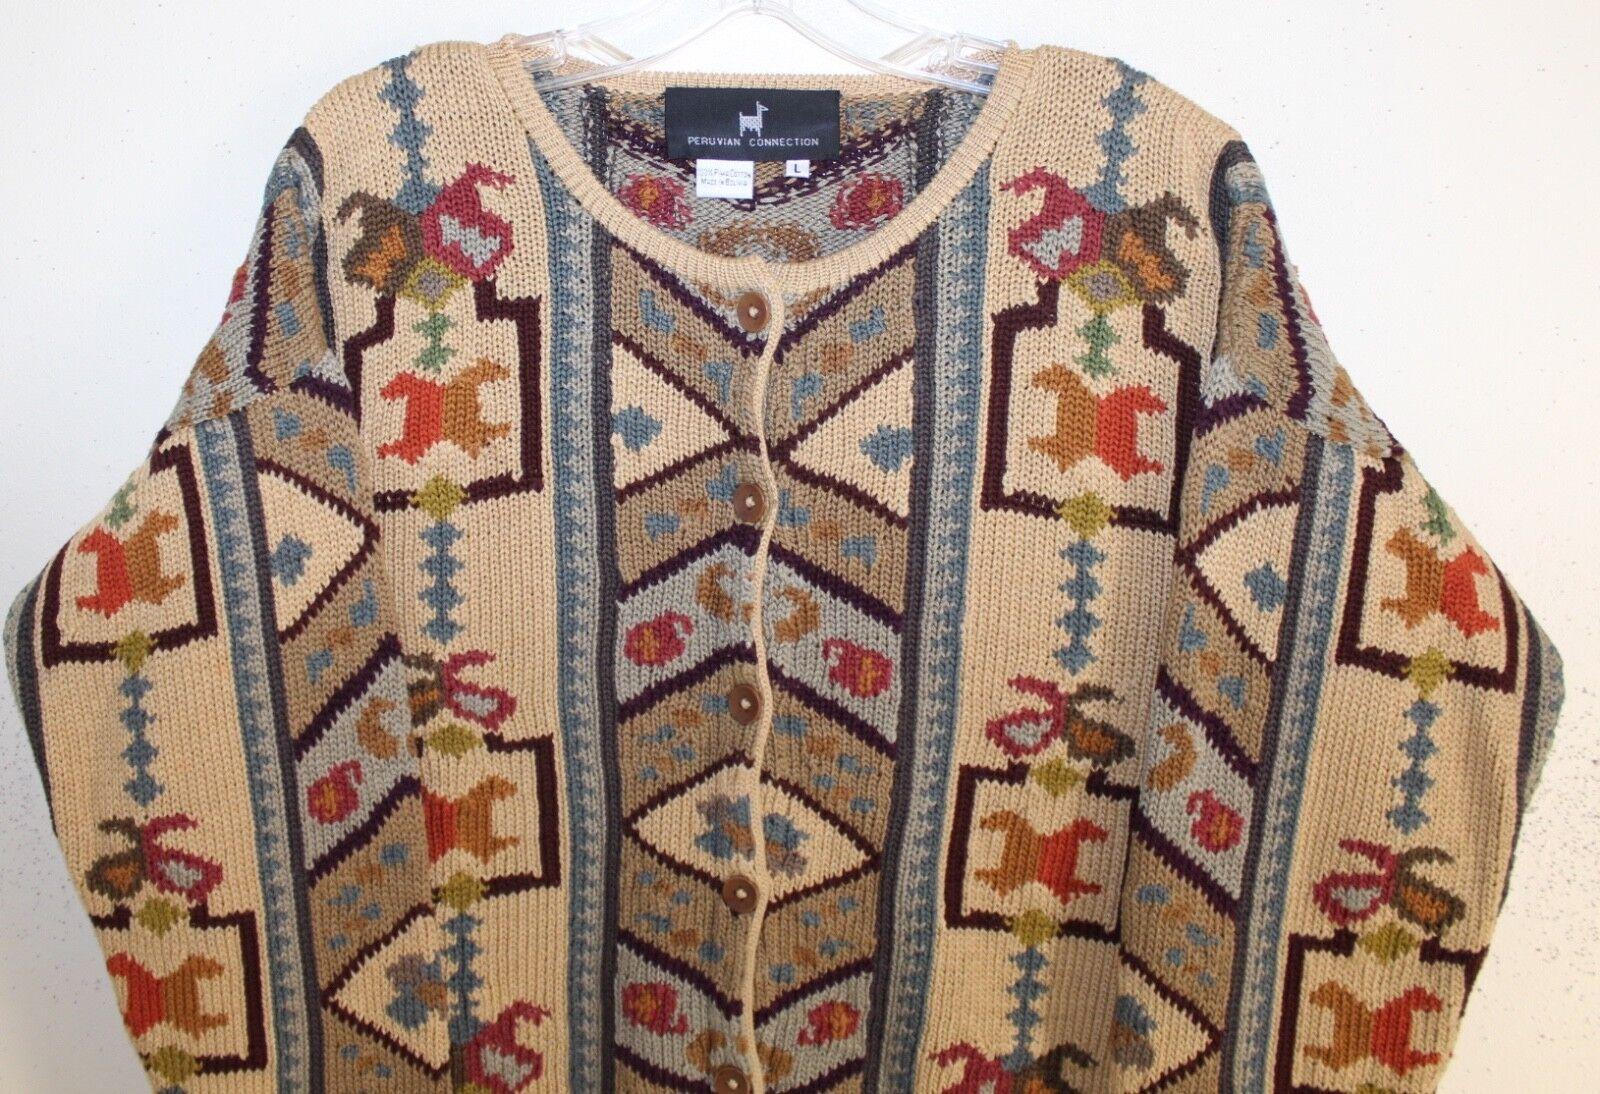 Peruvian Peruvian Peruvian Connection Sz L or M Fine Funky Ethnic Art-to-Wear Cardigan Sweater 57e295